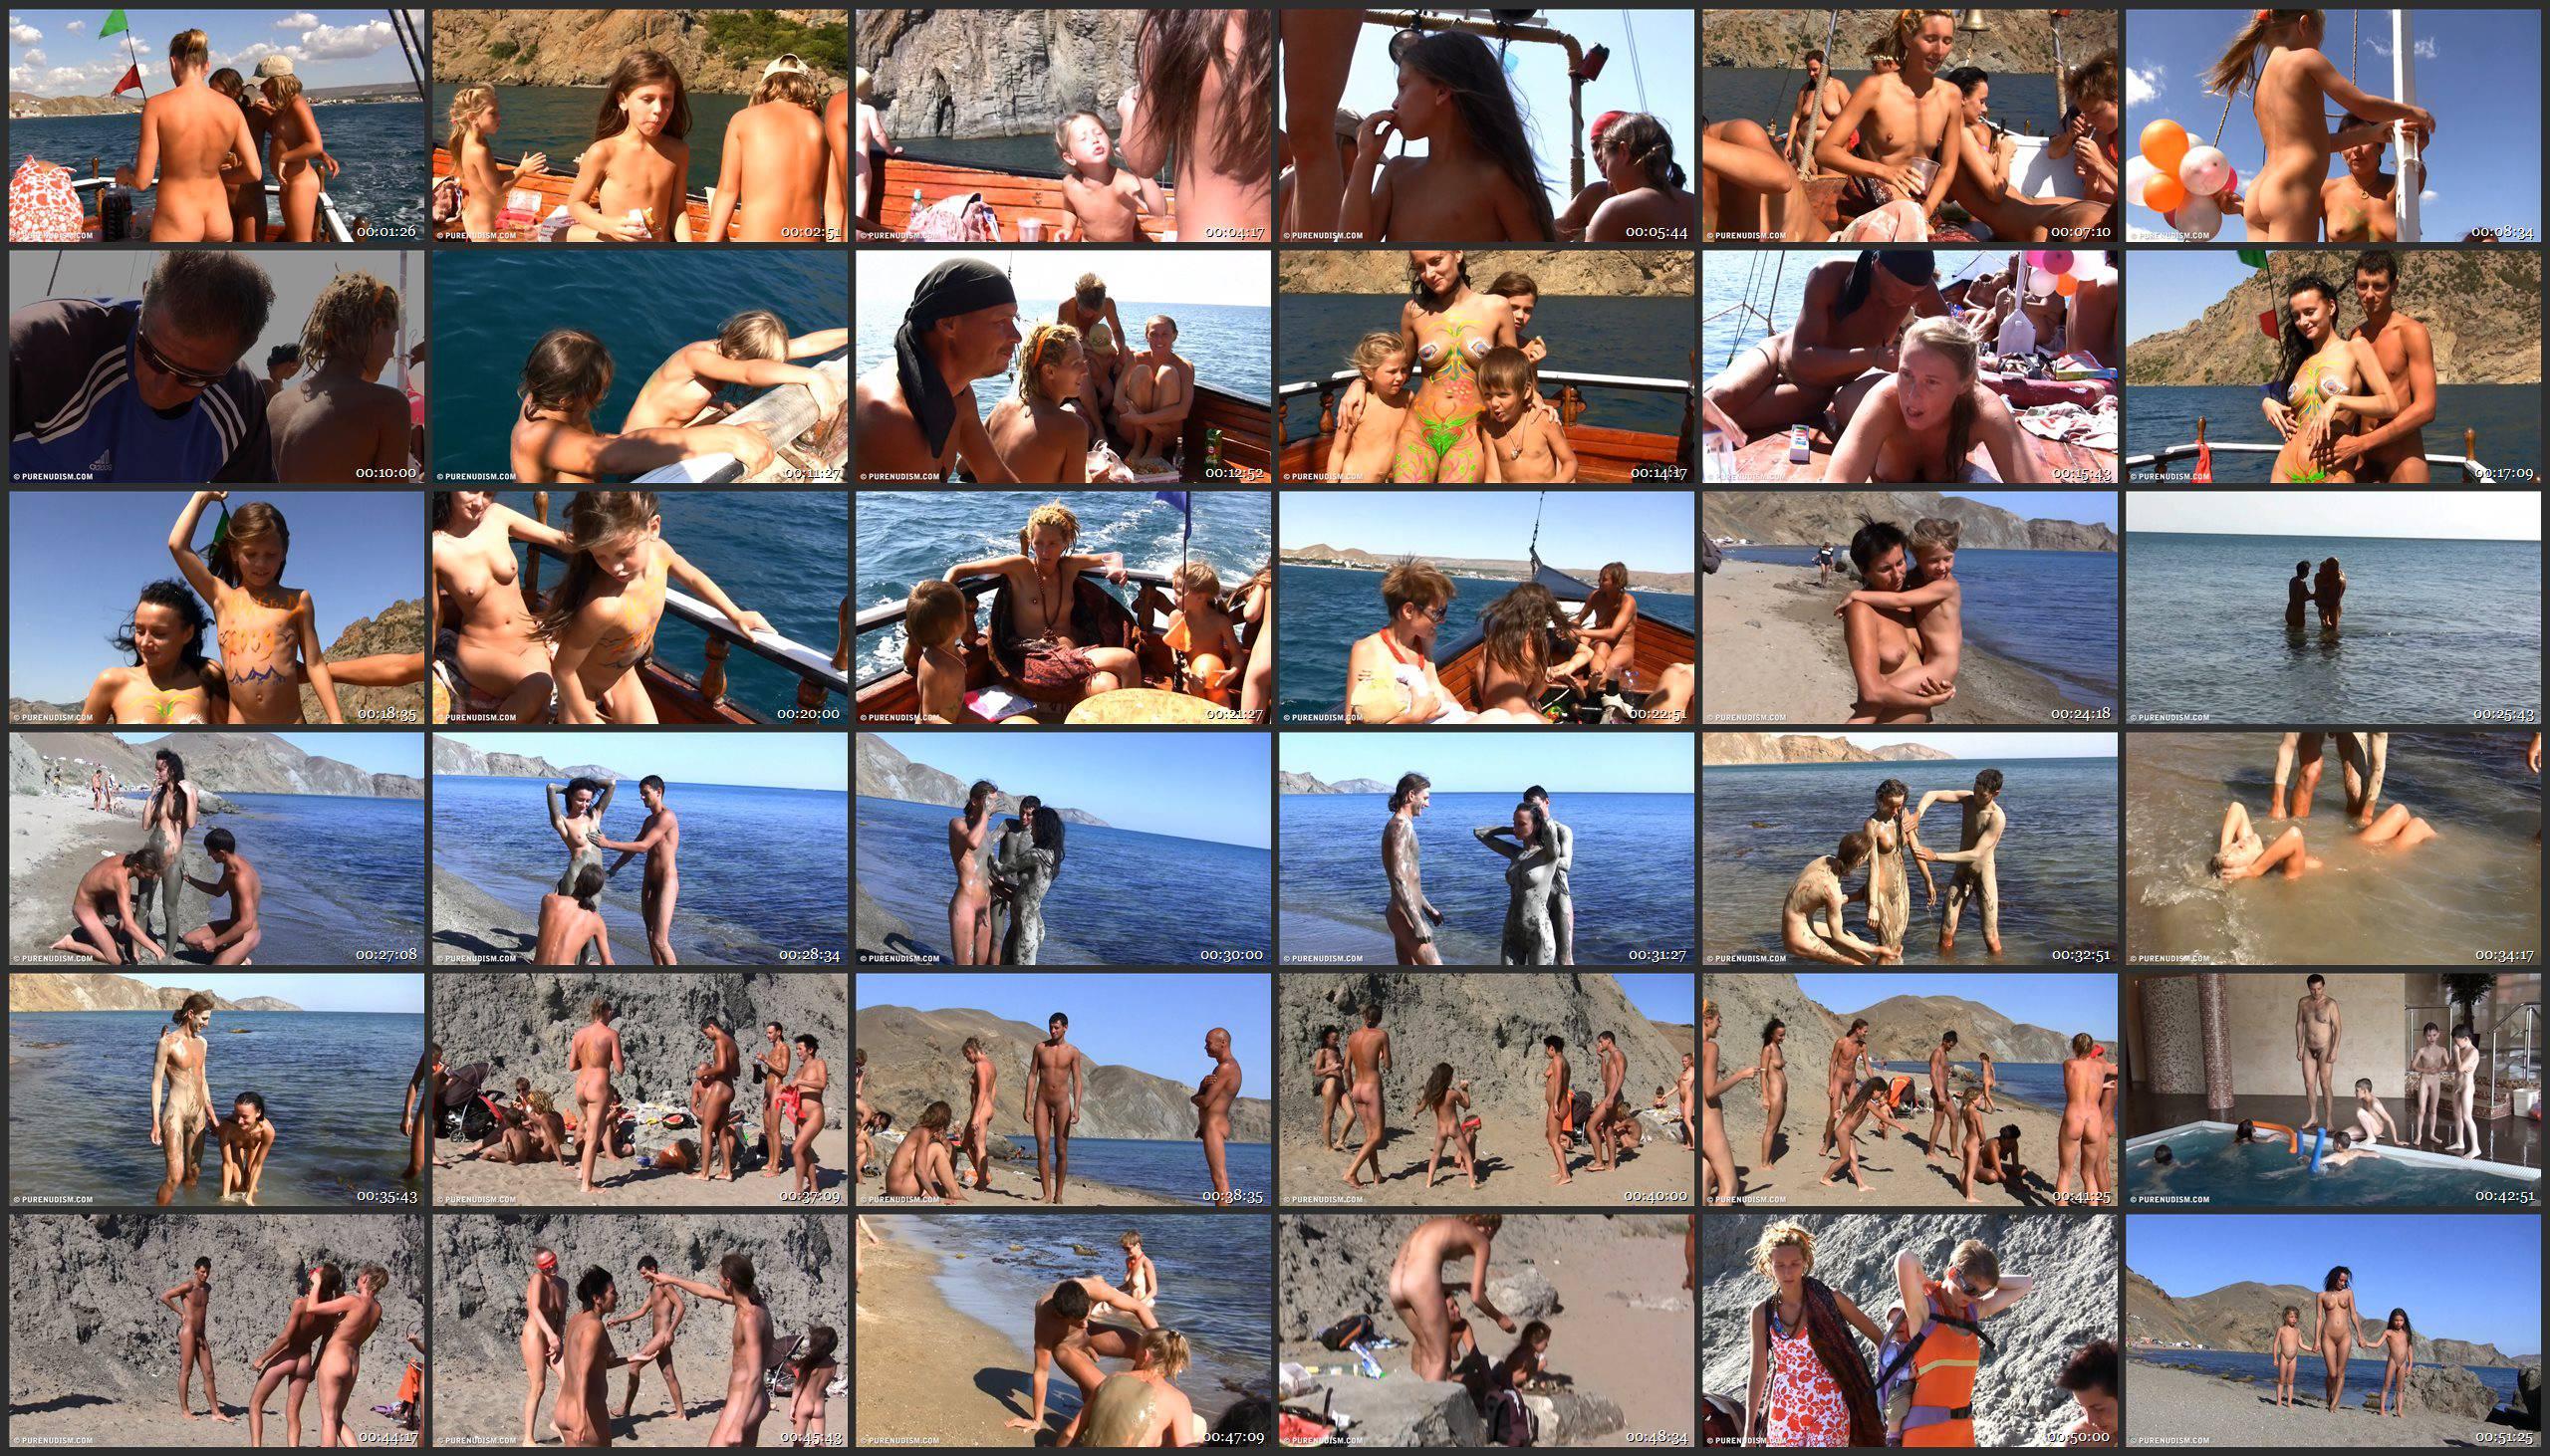 Pure Nudism Ukrainian Sea Boating - Thumbnails